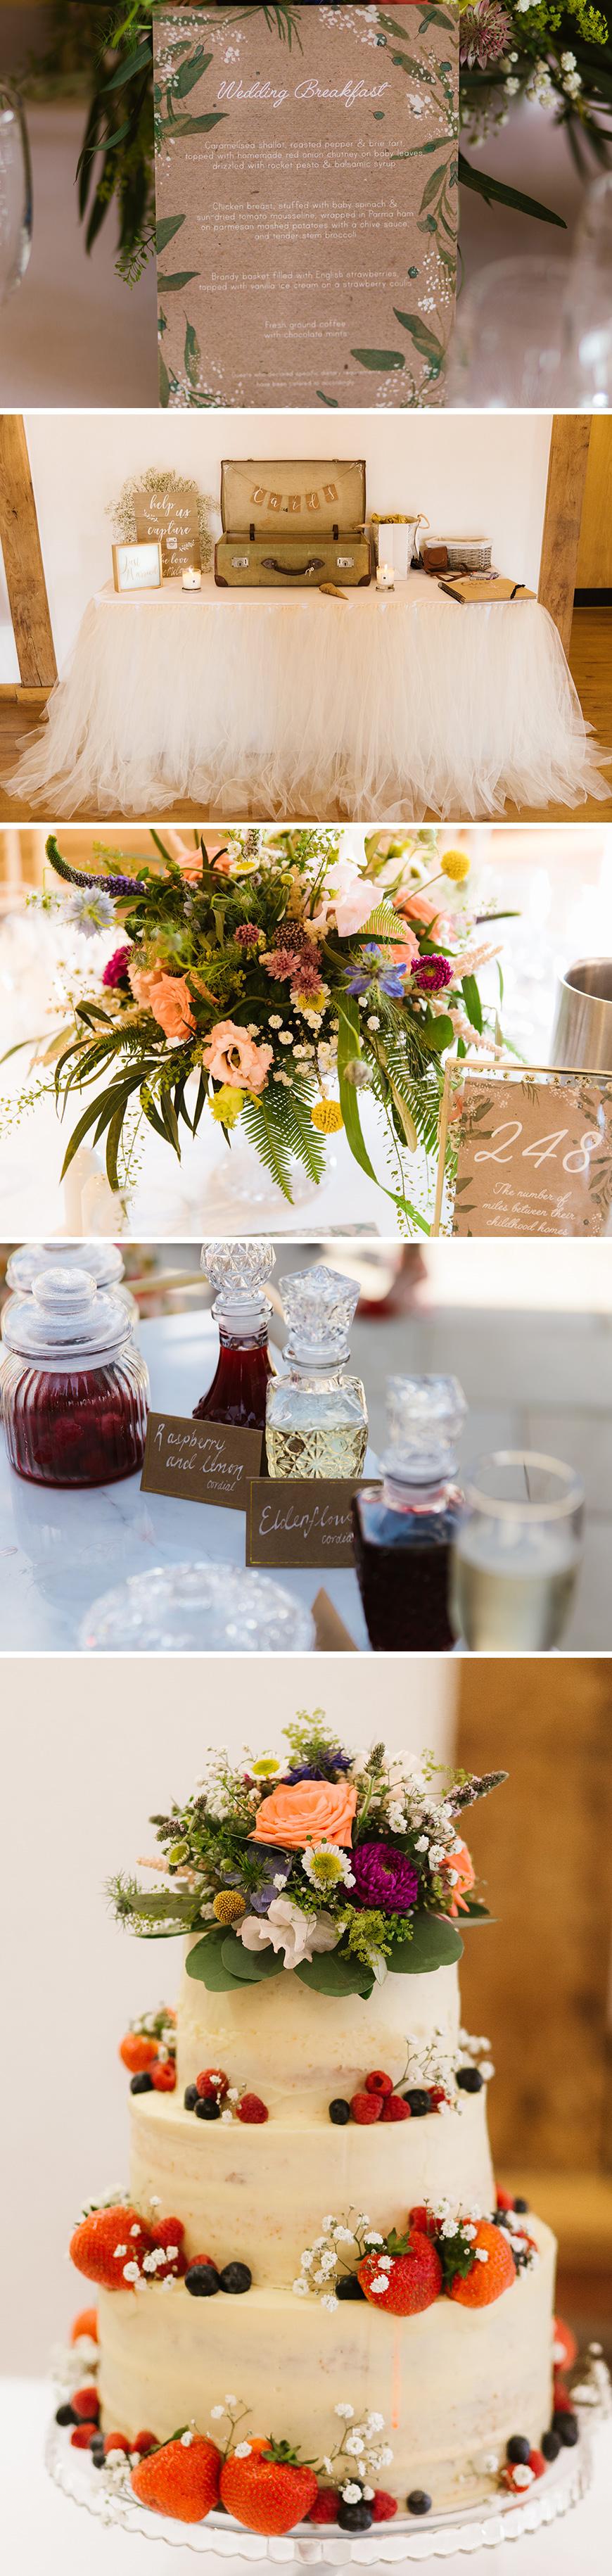 Real Wedding - Hannah and Joe's Fun-Filled Summer Wedding at Sandhole Oak Barn | CHWV